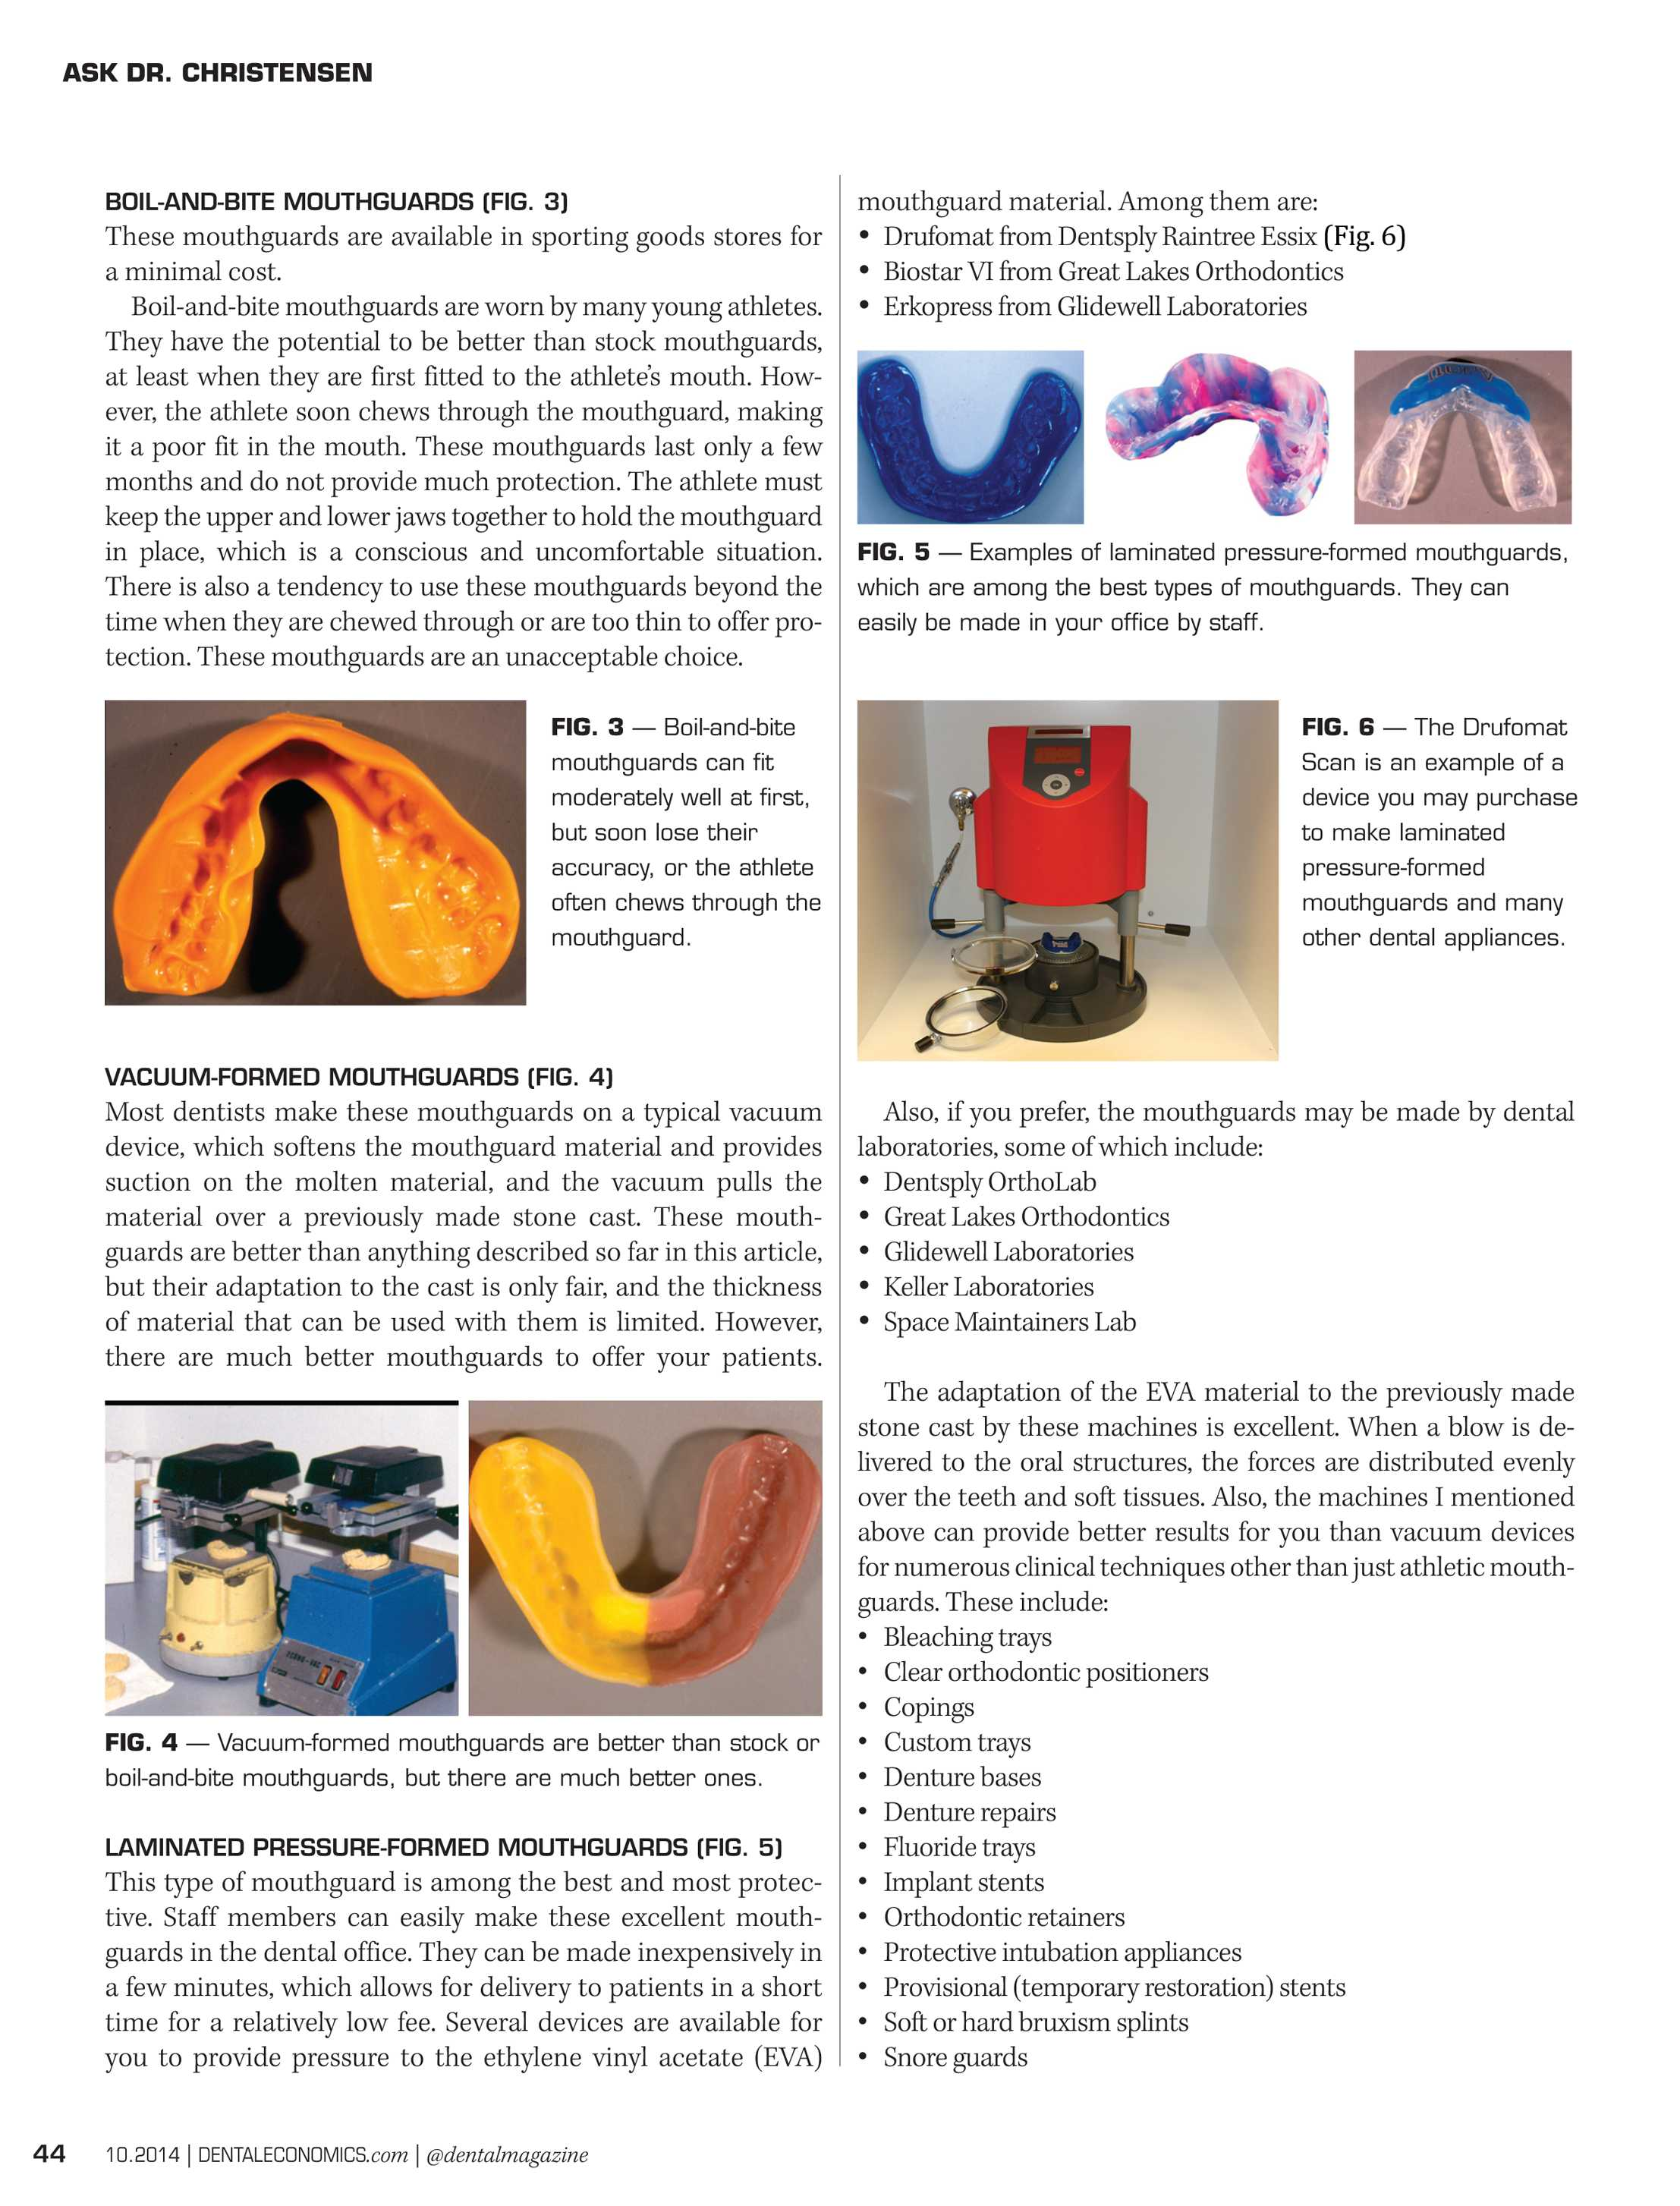 Dental Economics - October 2014 - page 44